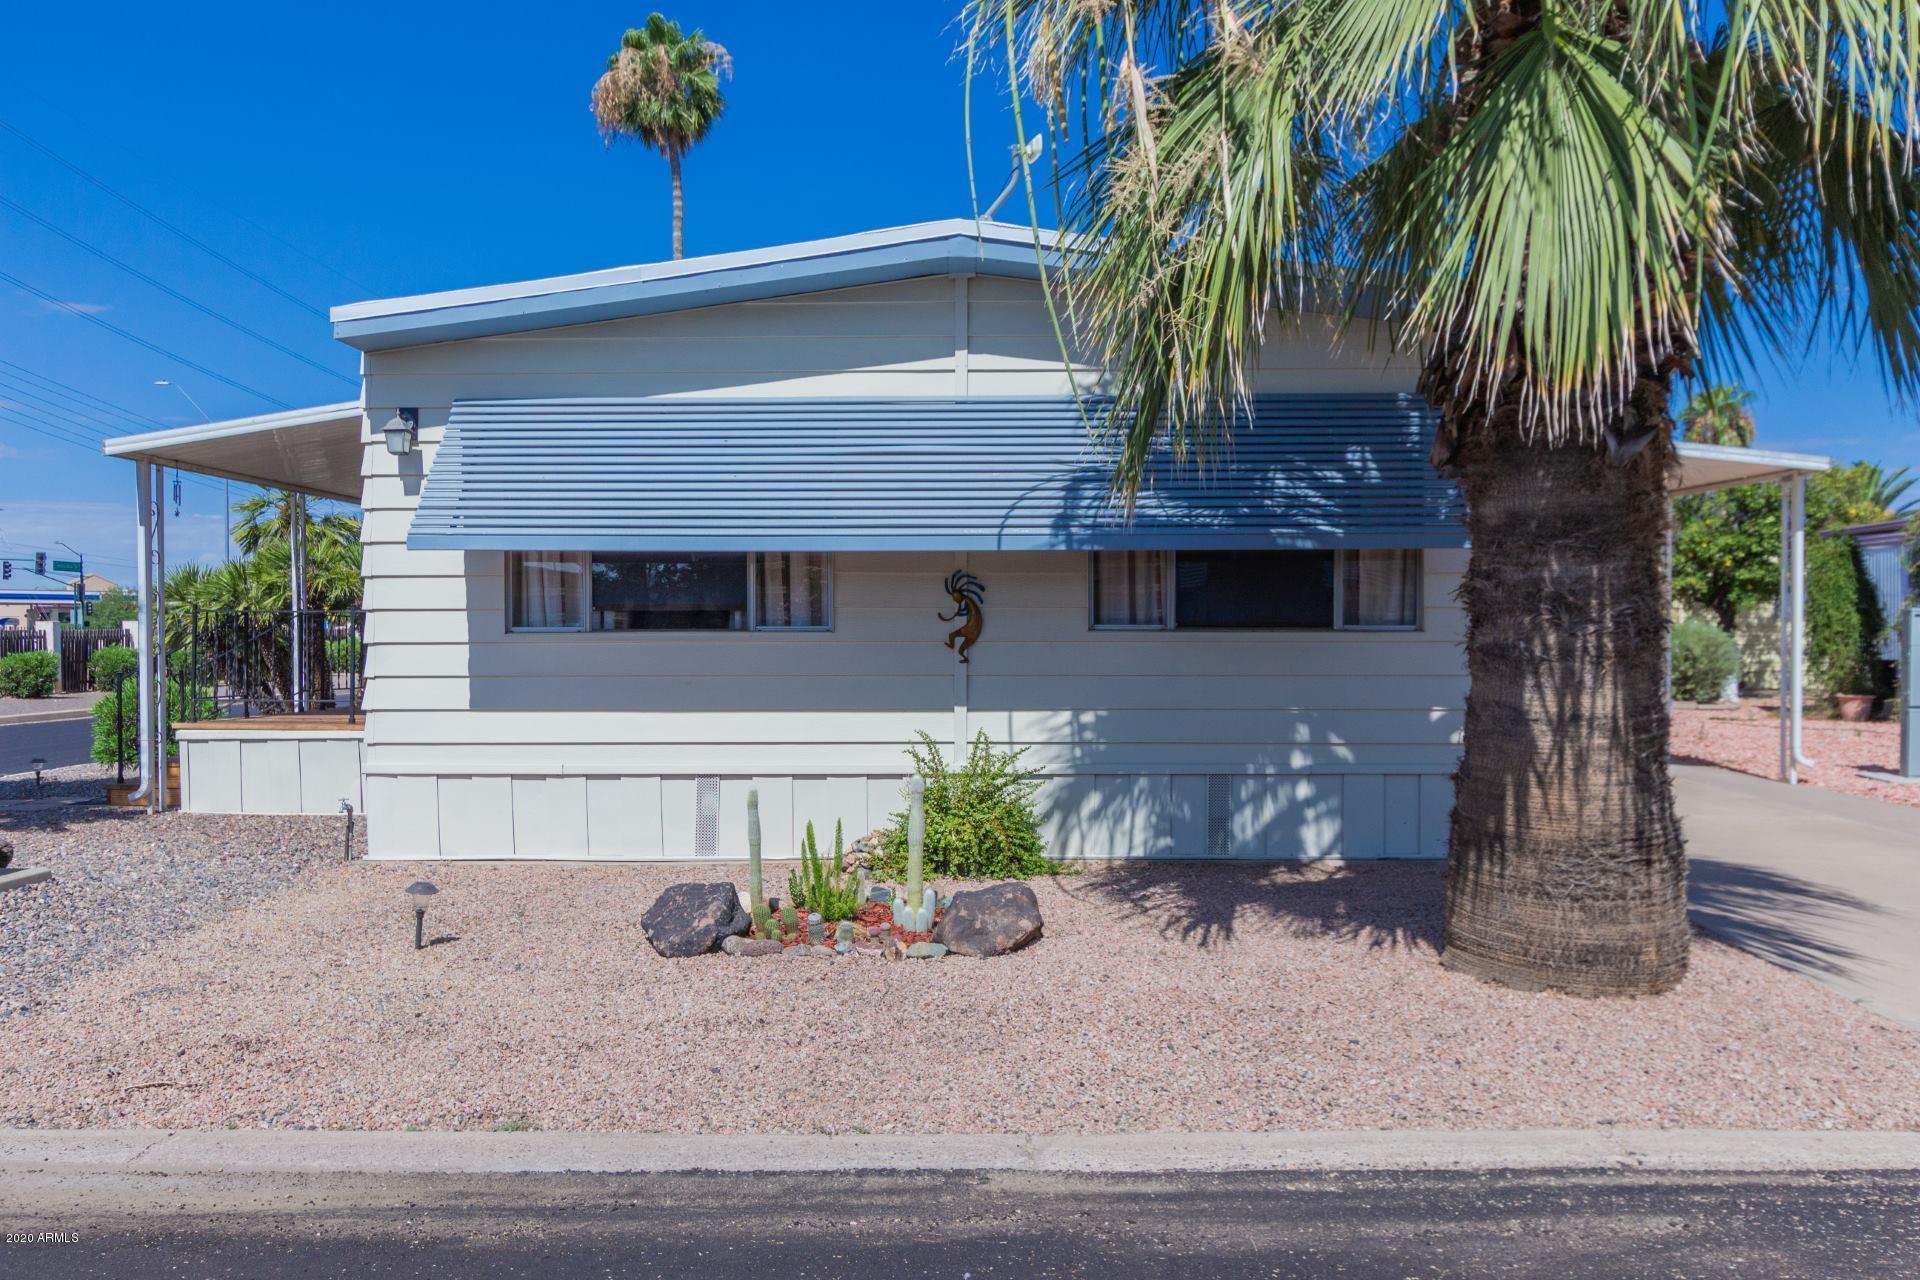 Photo of 2650 W UNION HILLS Drive #45, Phoenix, AZ 85027